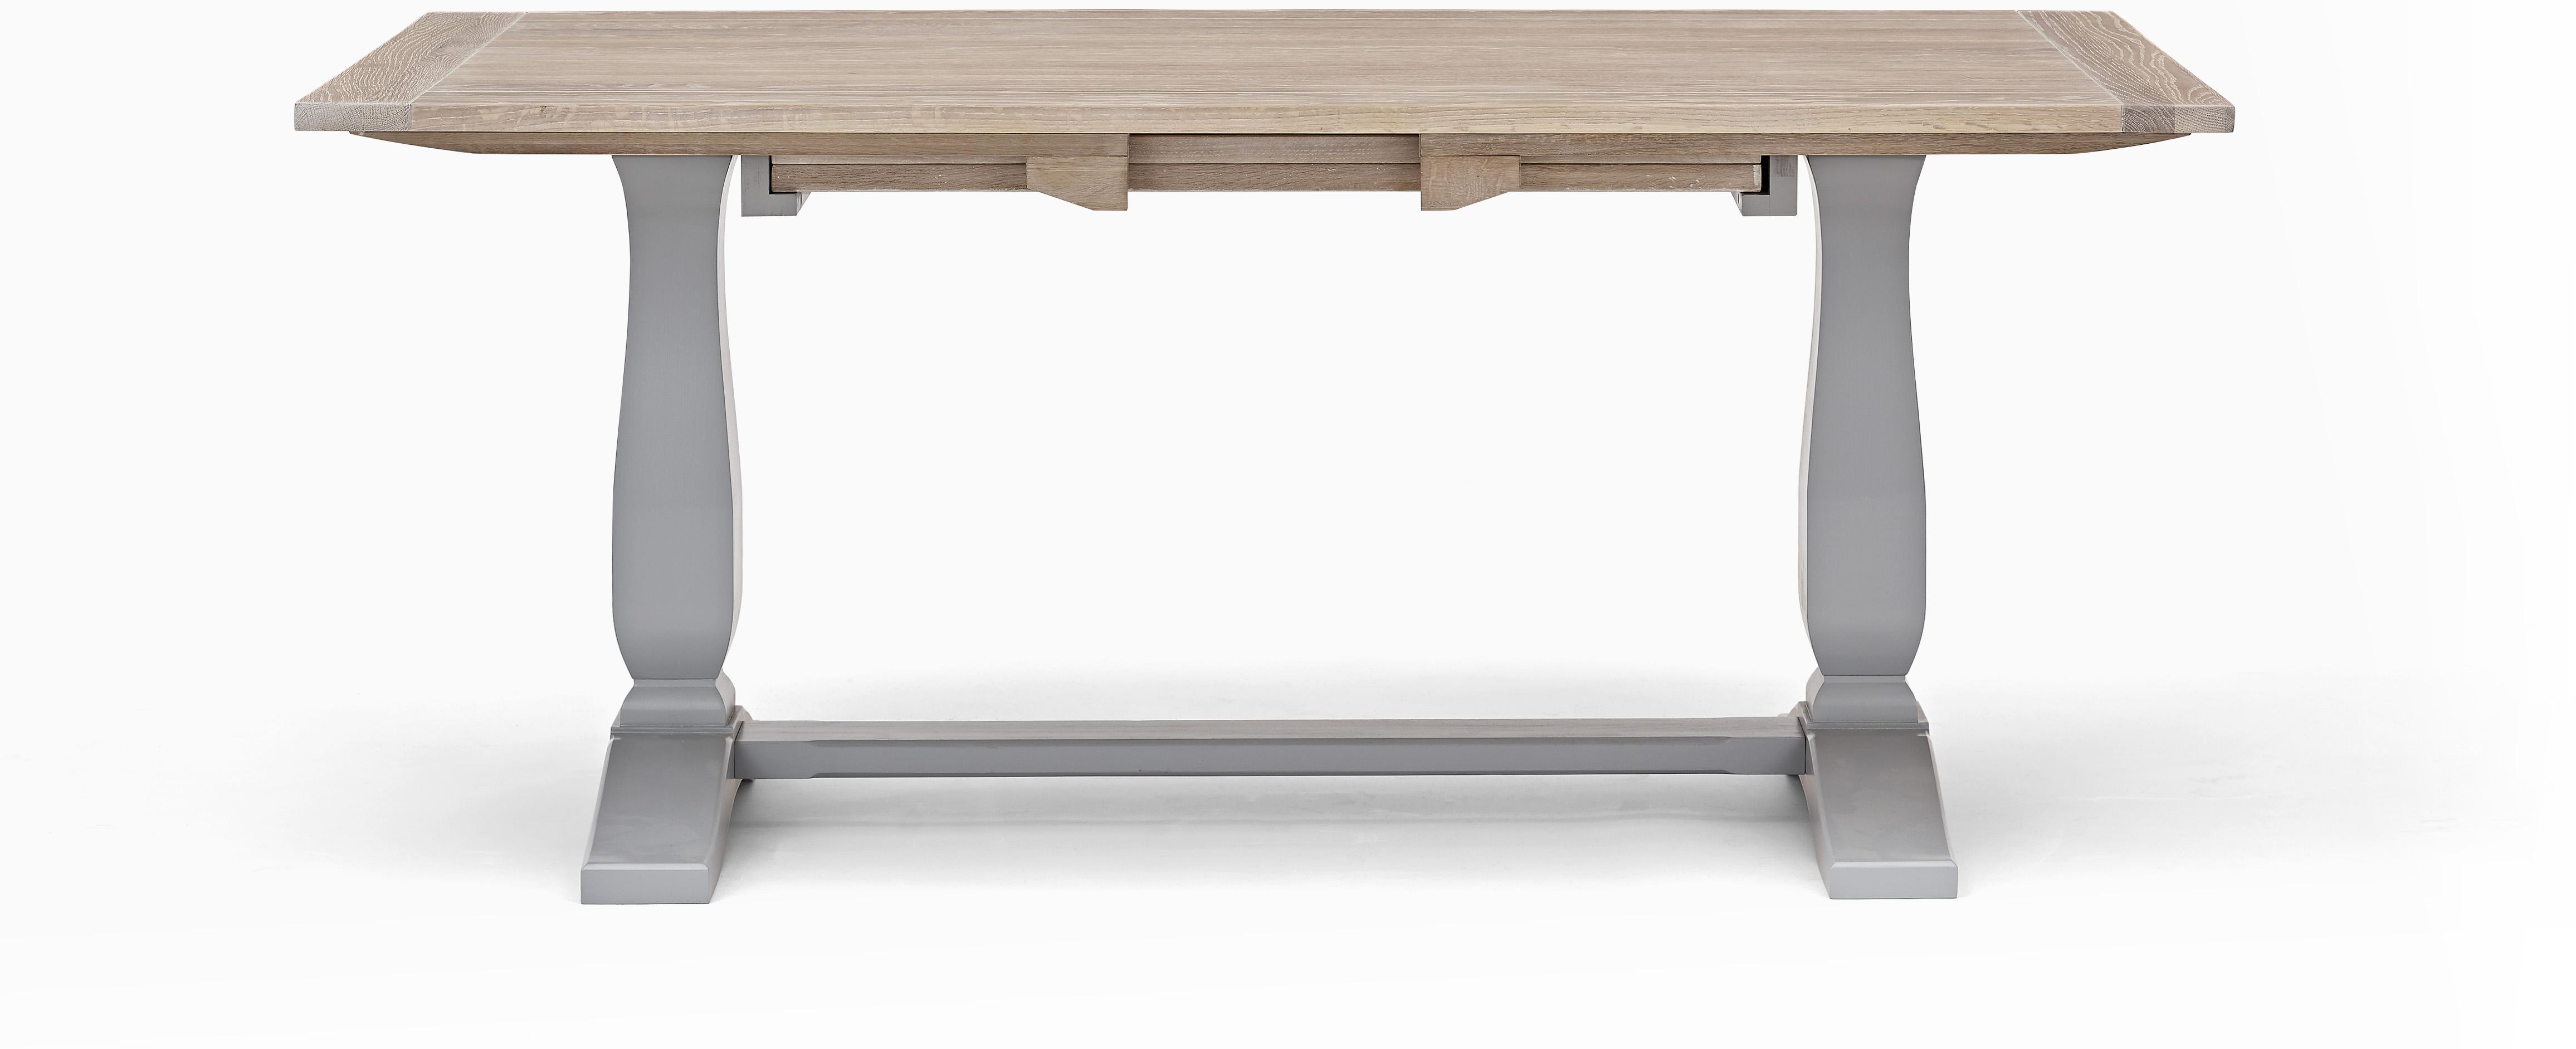 Harrogate 6-10 Seater Dining Table